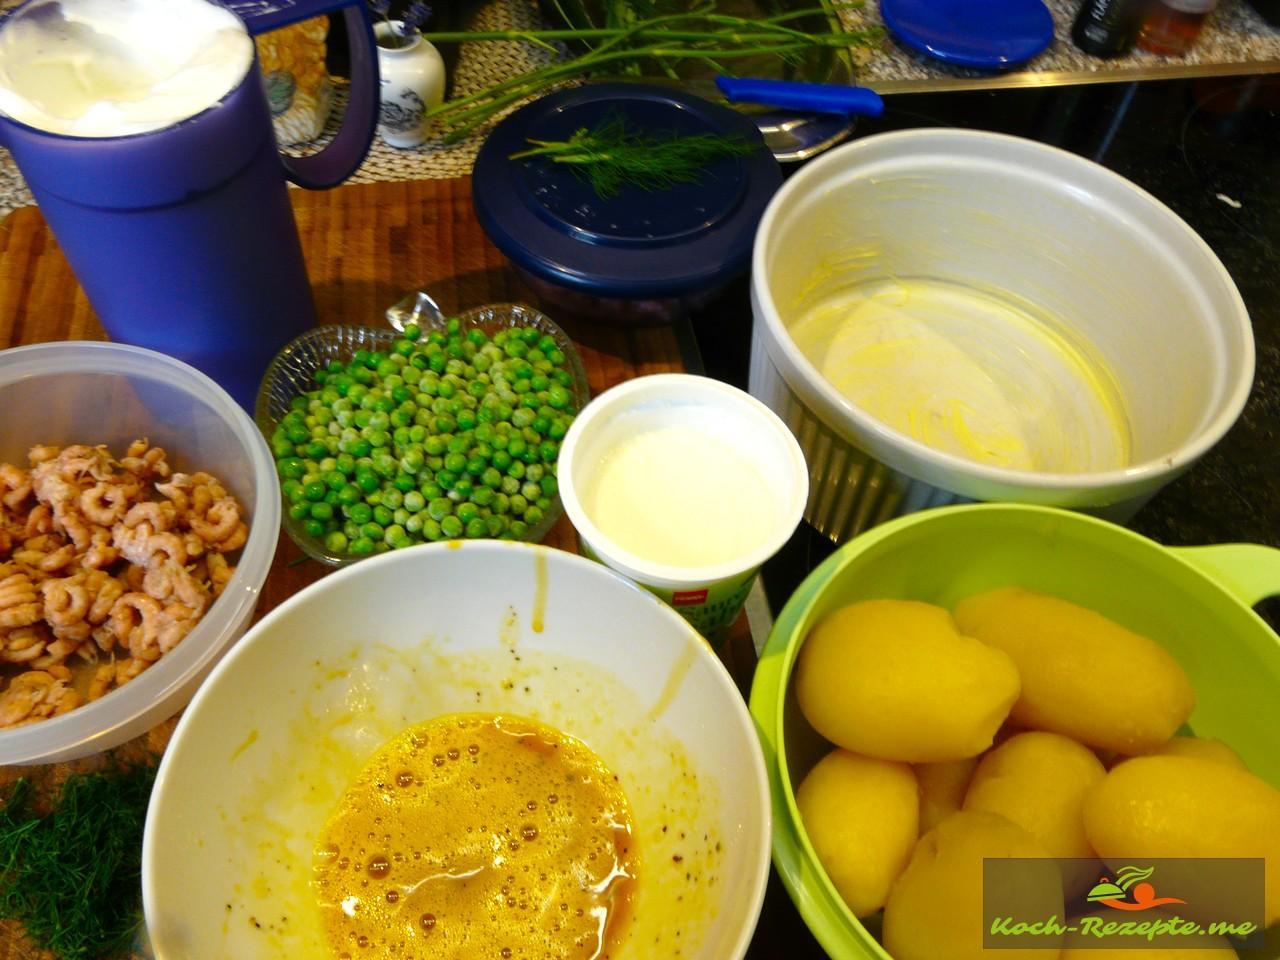 festkochende Kartoffeln,  Krabben frisch, TK Erbsen,  Eier trennen ,Saure Sahne , Salz ,Pfeffer, Dillspitzen, Butter